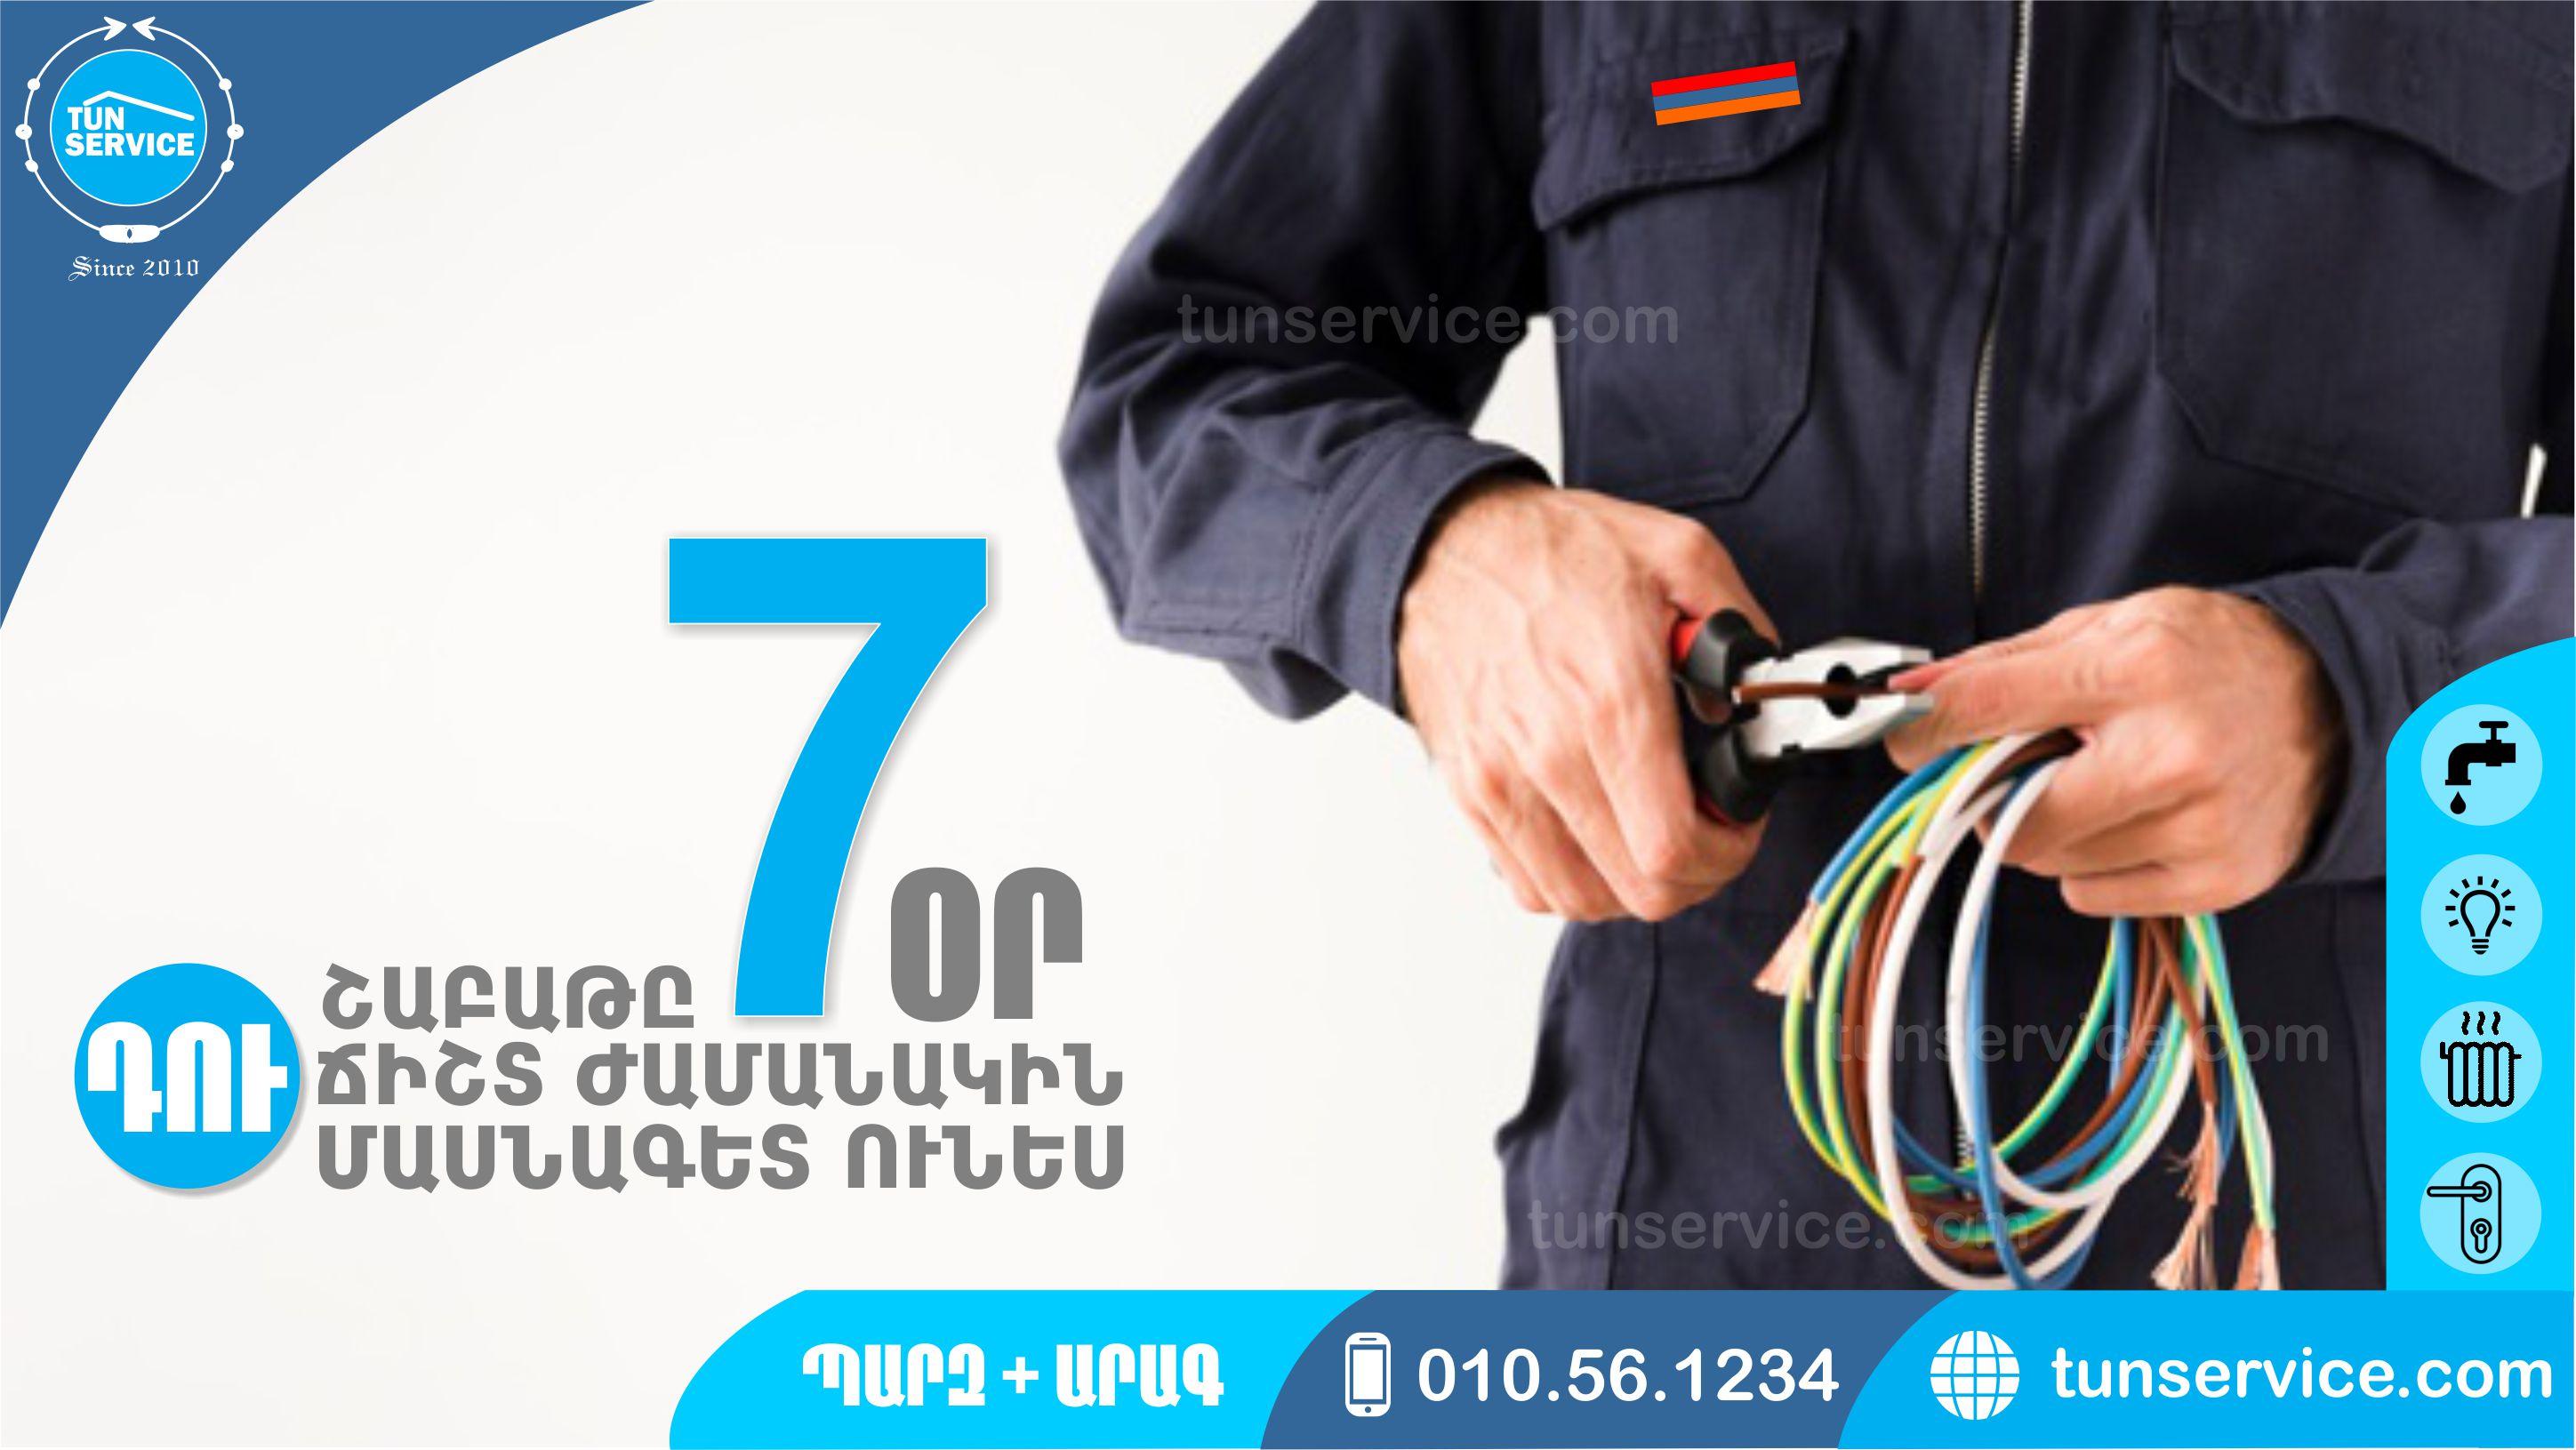 idealmaster-master-ideal-varpet-sarqox-santexnik-tunservice